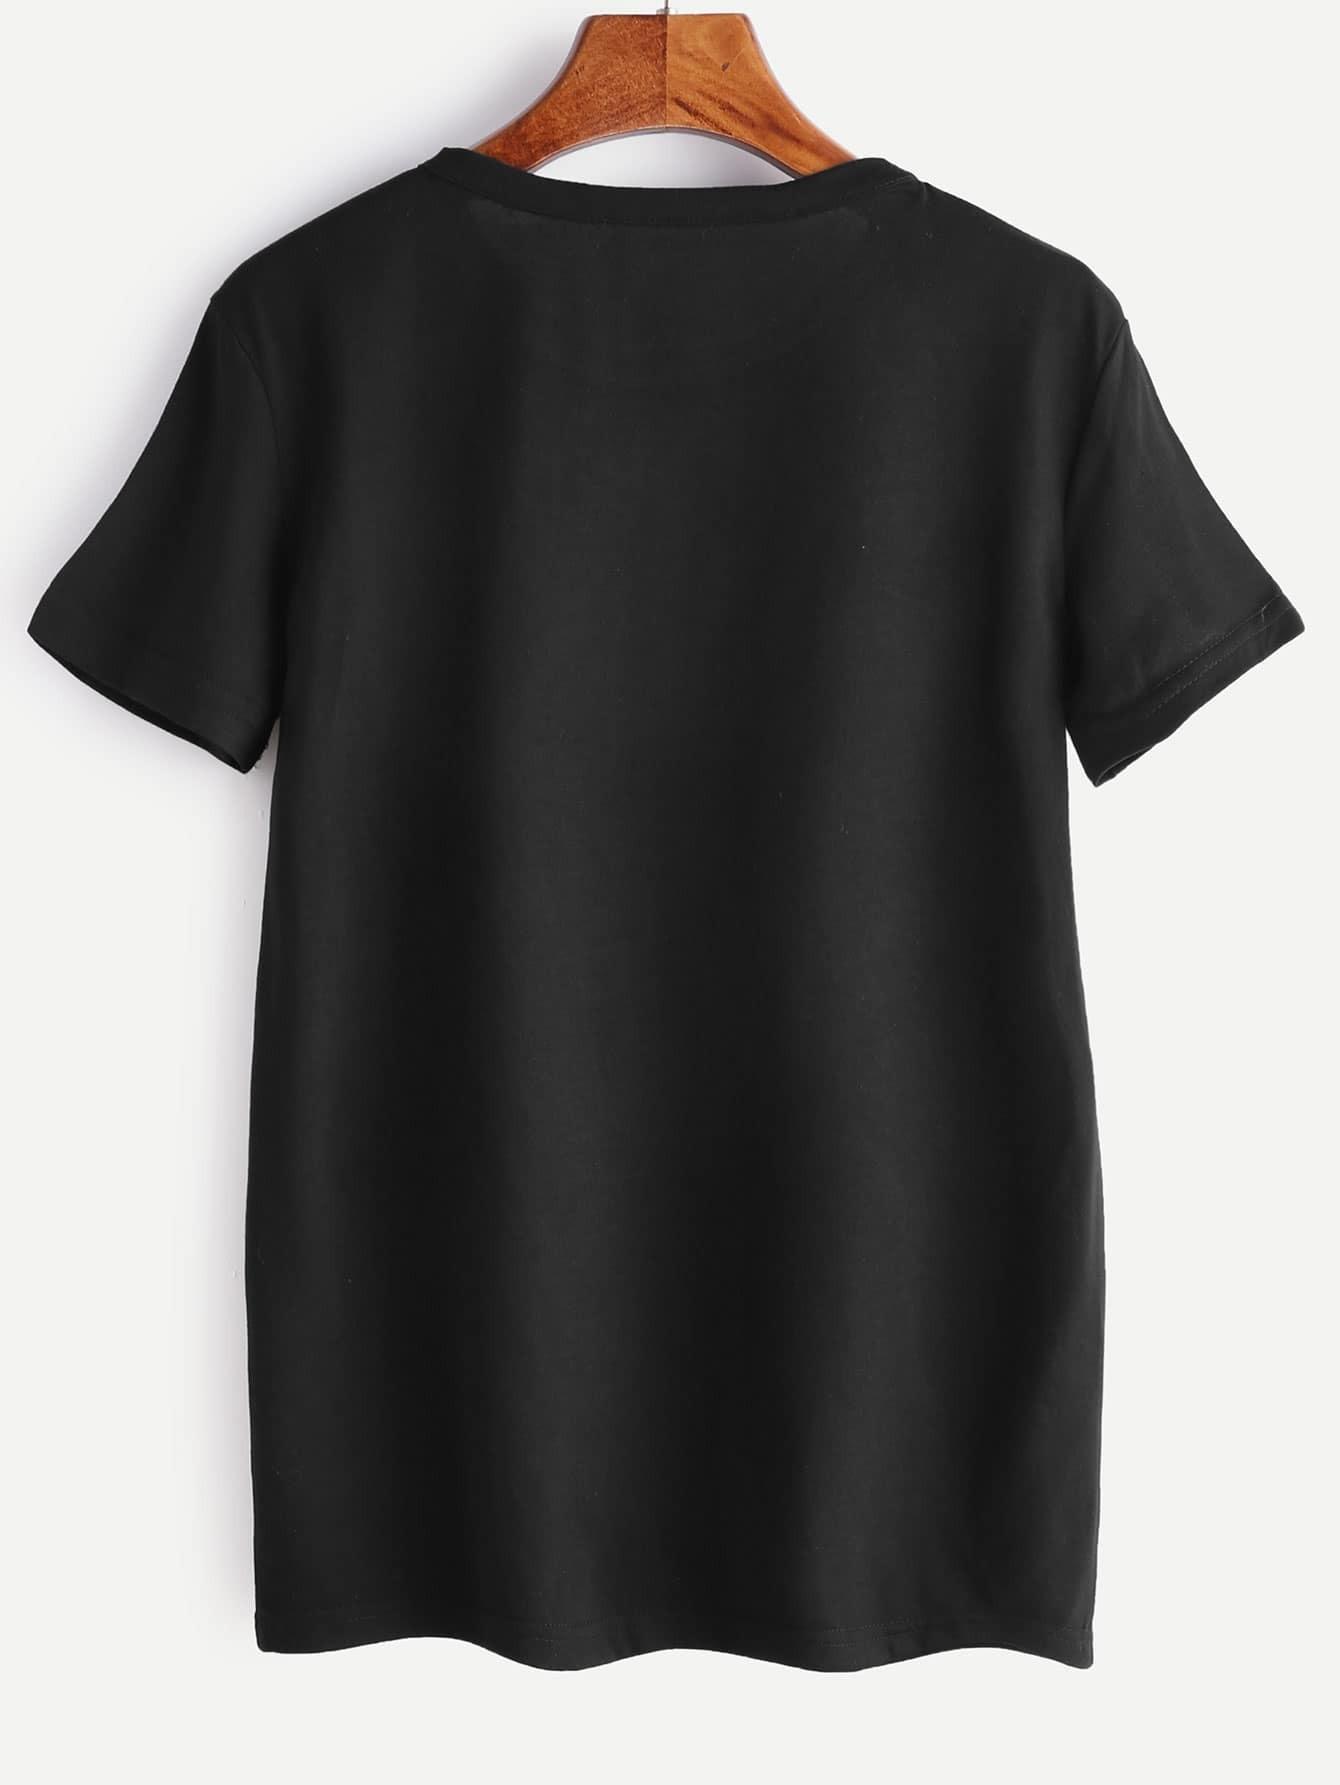 t shirt noir d 39 impression de lettre french romwe. Black Bedroom Furniture Sets. Home Design Ideas